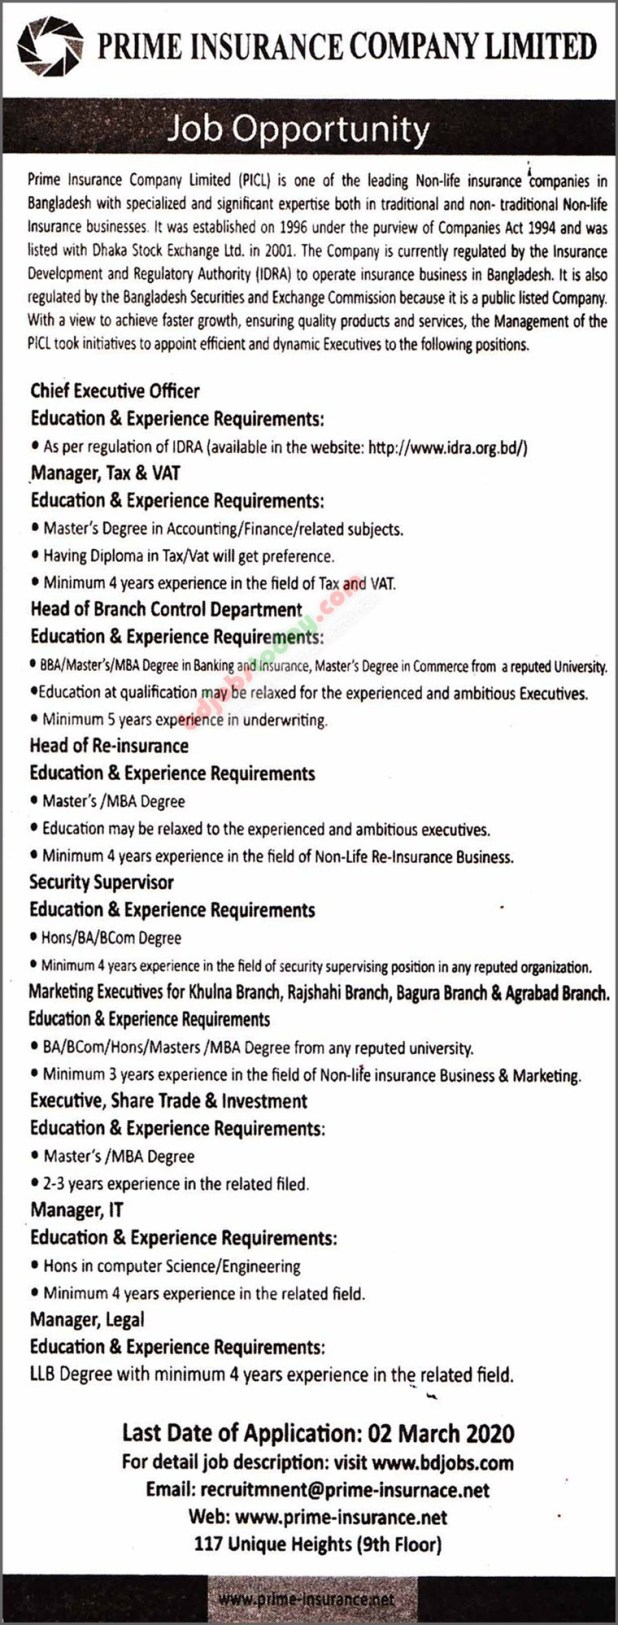 Prime Insurance Company Ltd Job circular 2020